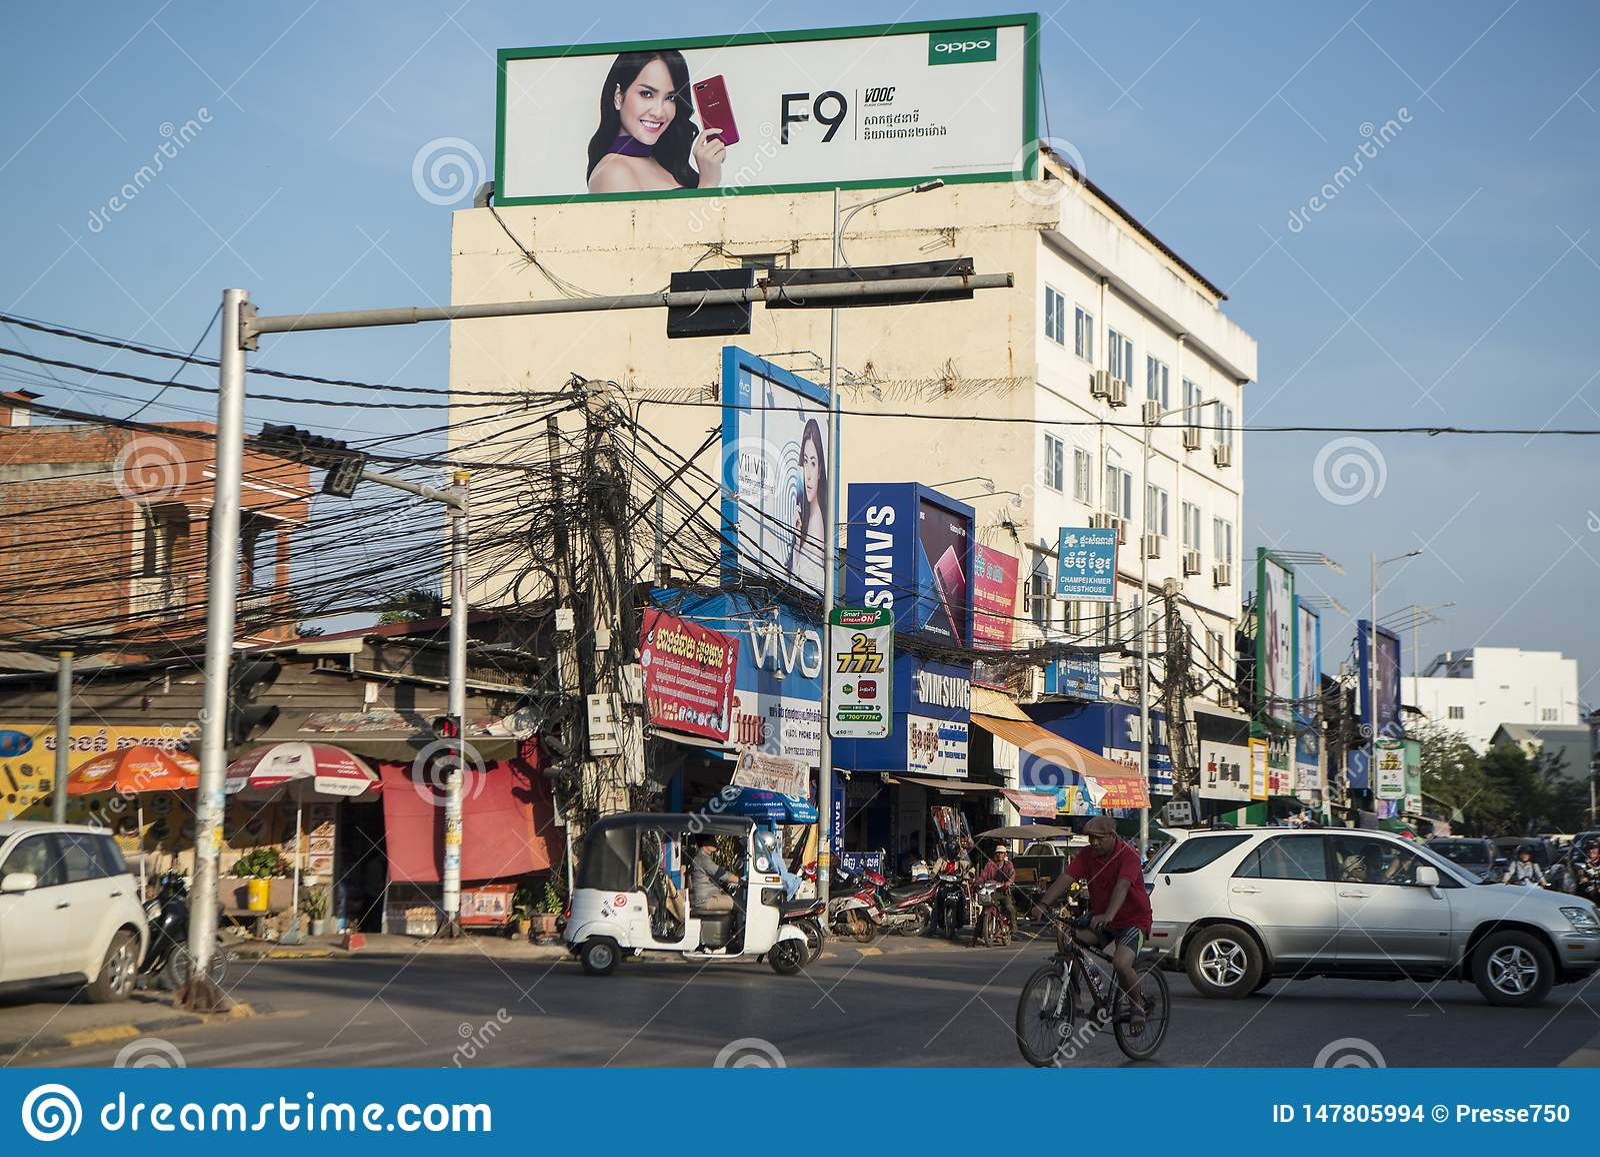 CAMBODIA SIEM REAP CITY